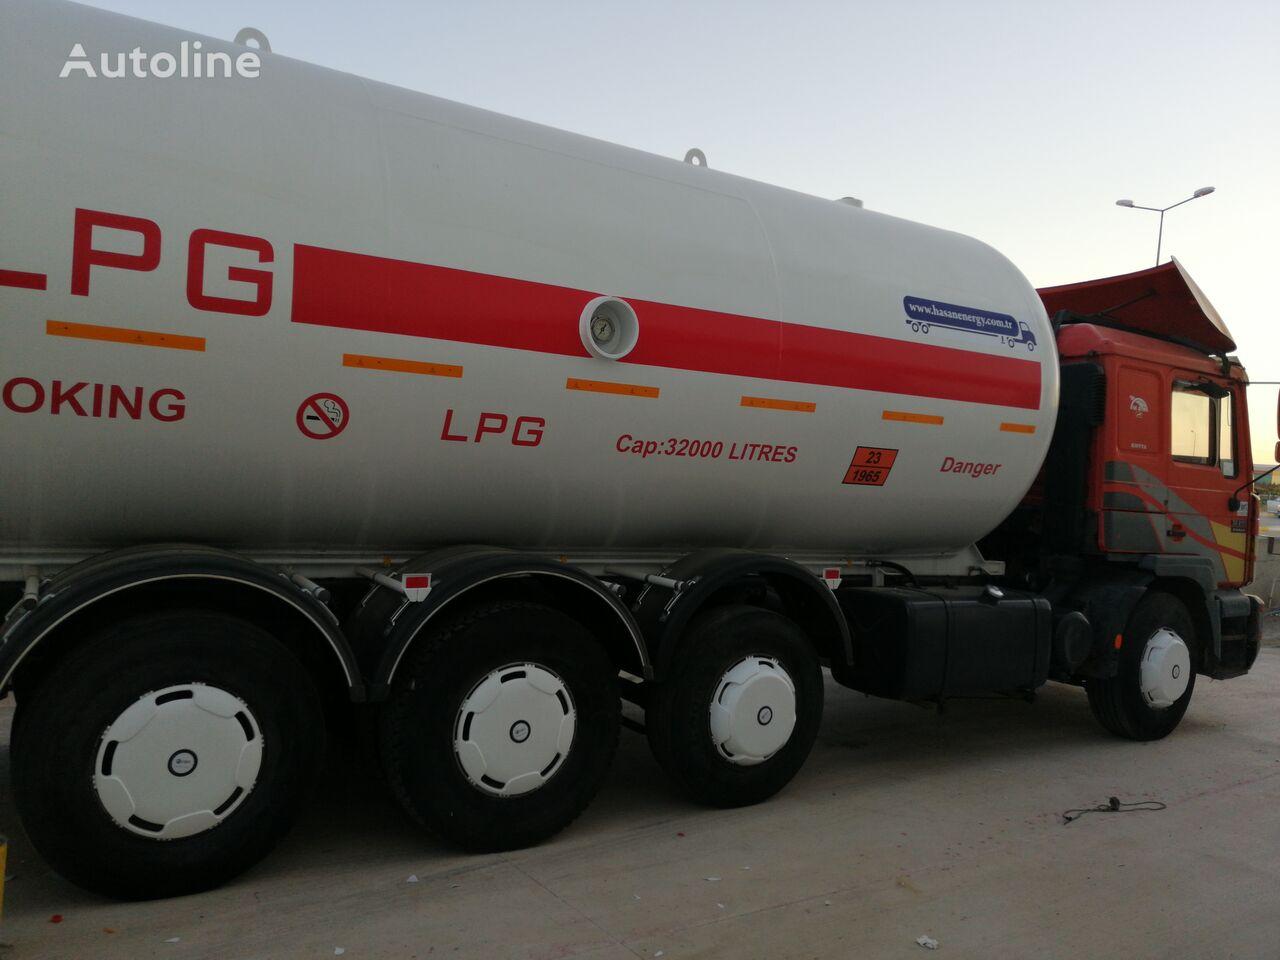 شاحنة نقل الغاز MAN TOP SYSTEM NEW BUILDED 32000L And 24000L LPG Bobtail LAST ONE IN